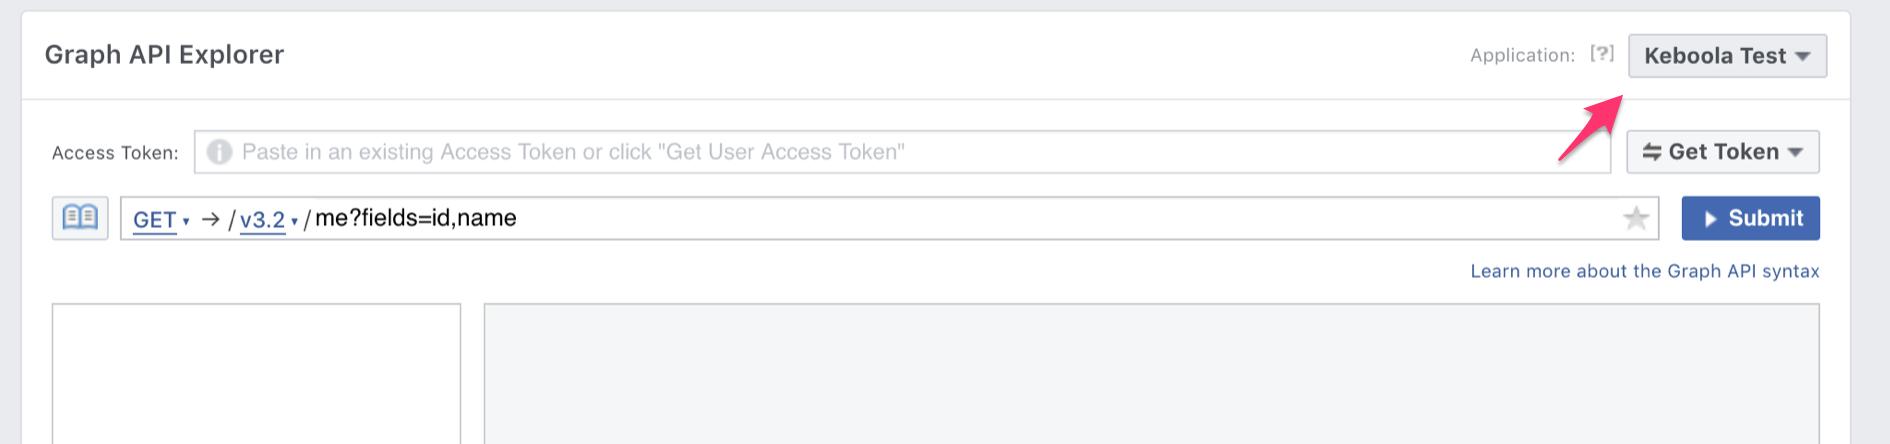 Get access token for instagram extractor via Facebook Graph API